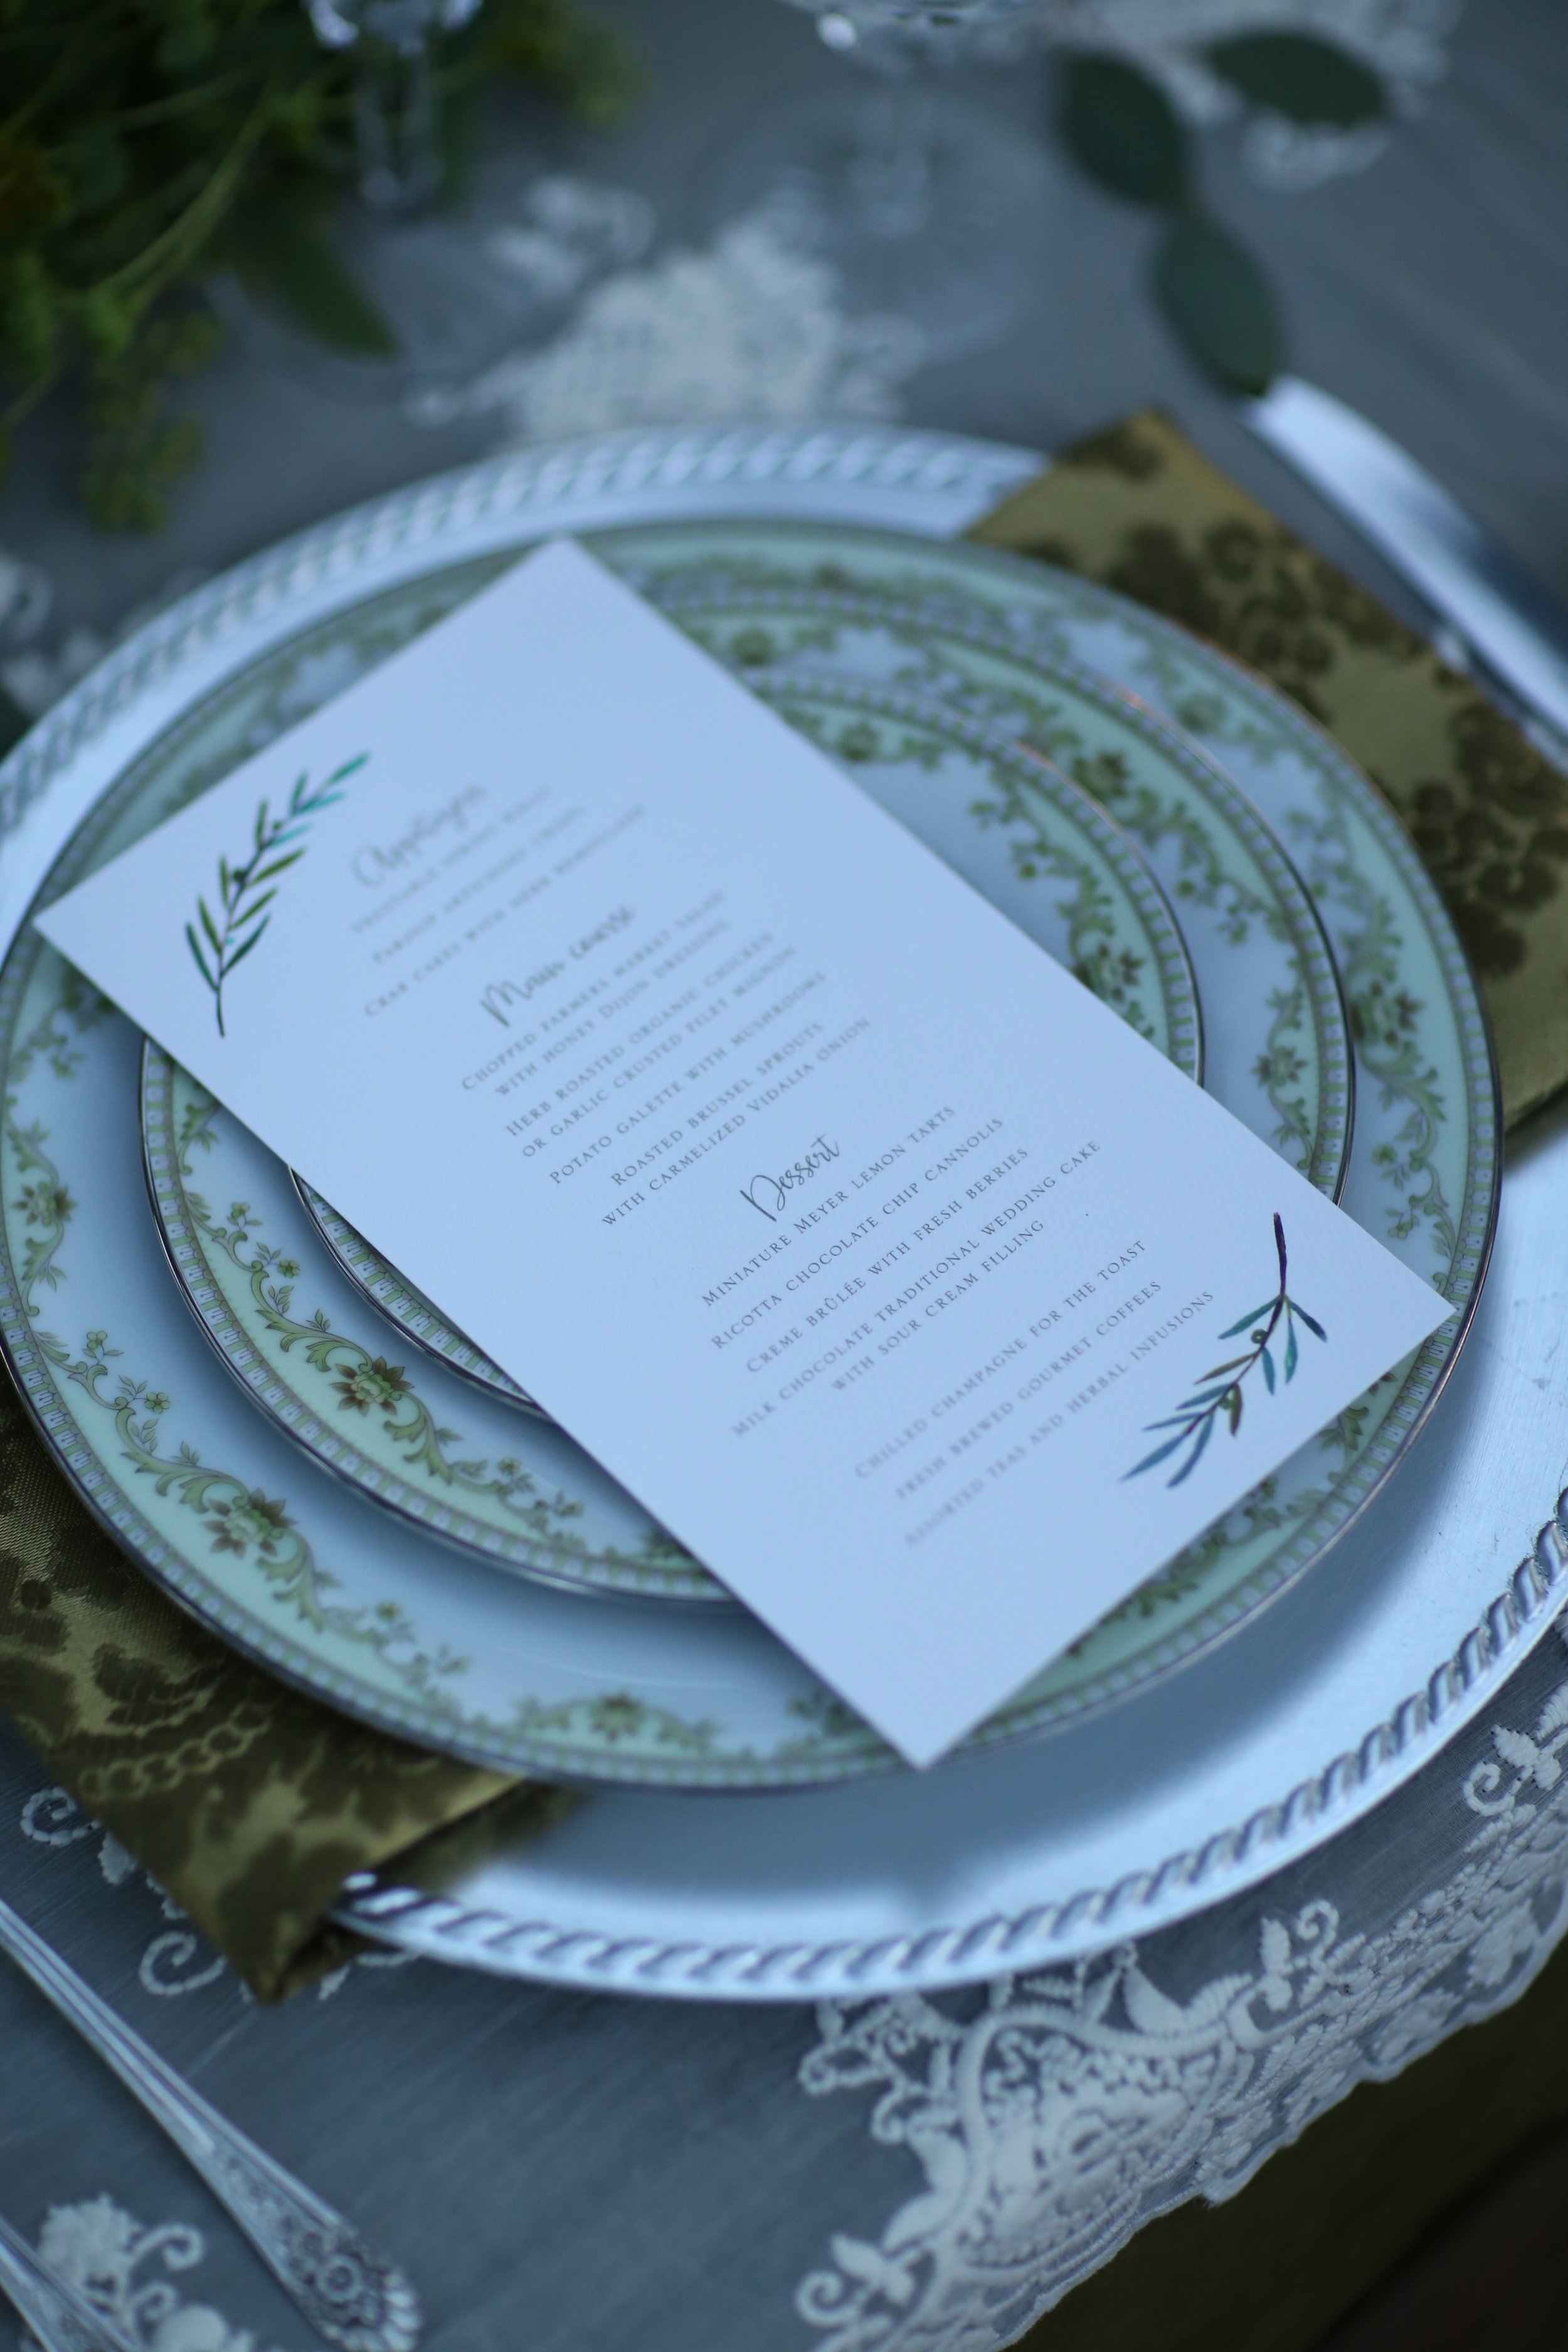 Vintage wedding rentals, mismatched china, charger plate, silver, napkins, linens.